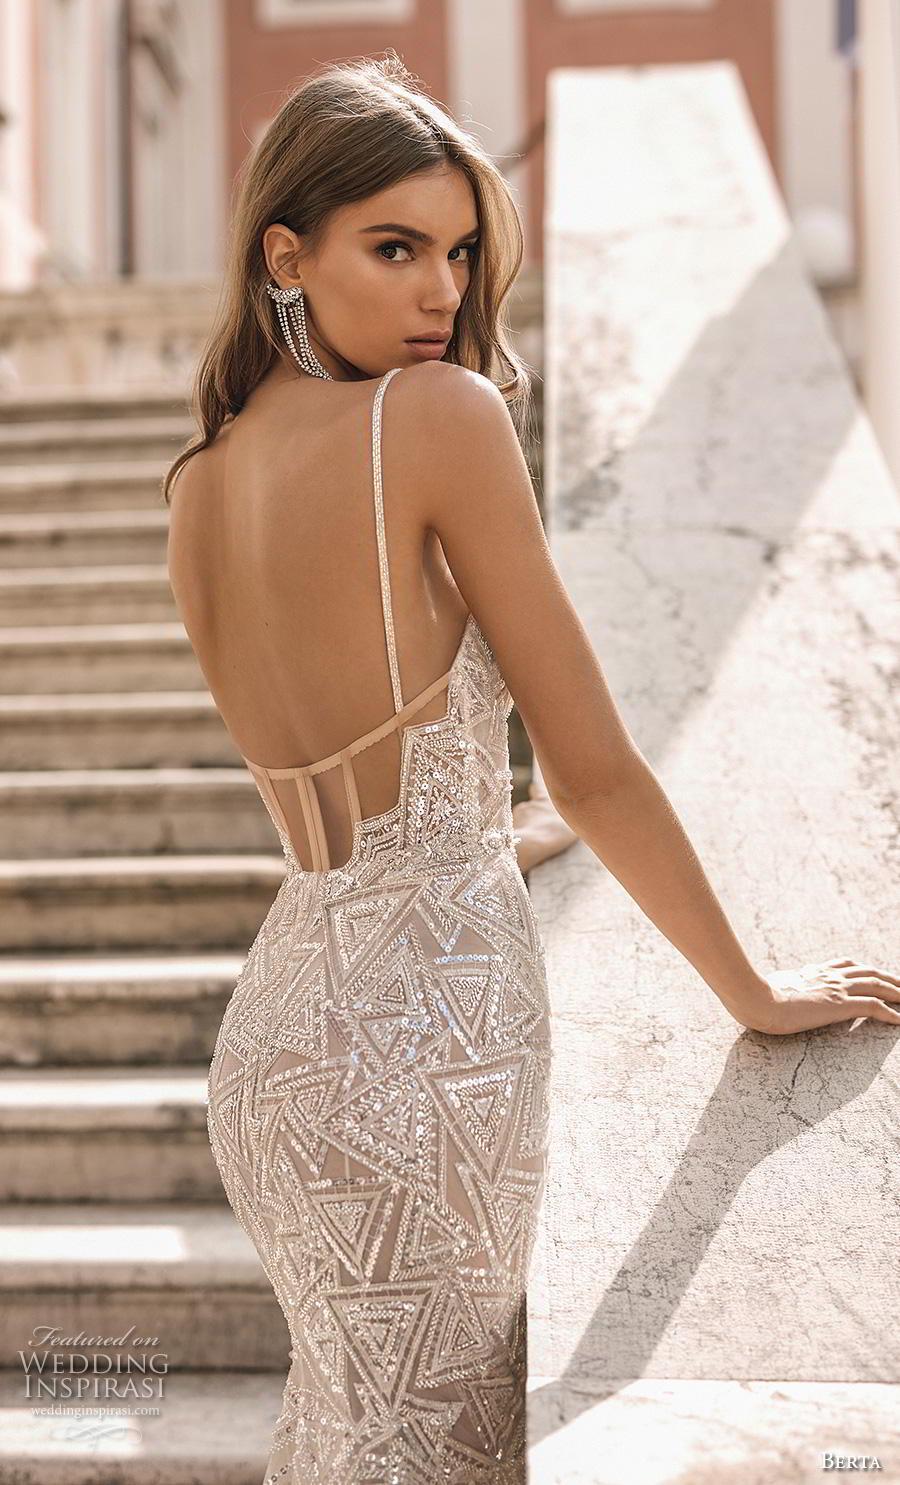 berta 2019 privee bridal thin strap sweetheart neckline full embellishment bustier glitzy glamorous elegant sheath wedding dress backless chapel train (8) zbv